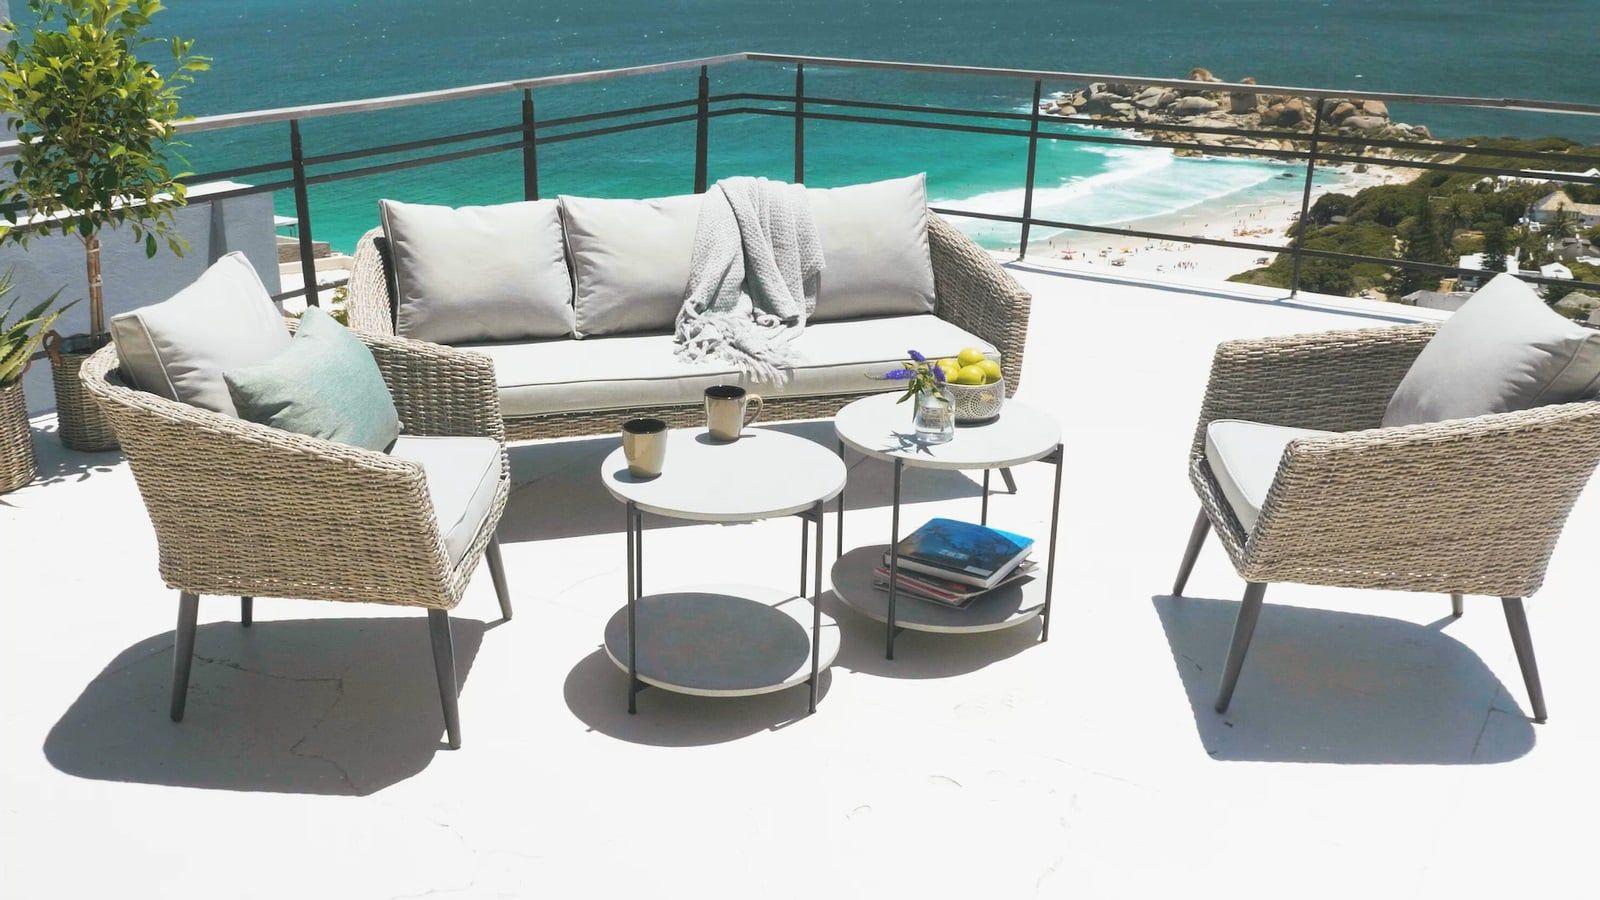 Vebbestrup Otta Jysk In 2020 Outdoor Sectional Sofa Outdoor Furniture Sets Outdoor Furniture